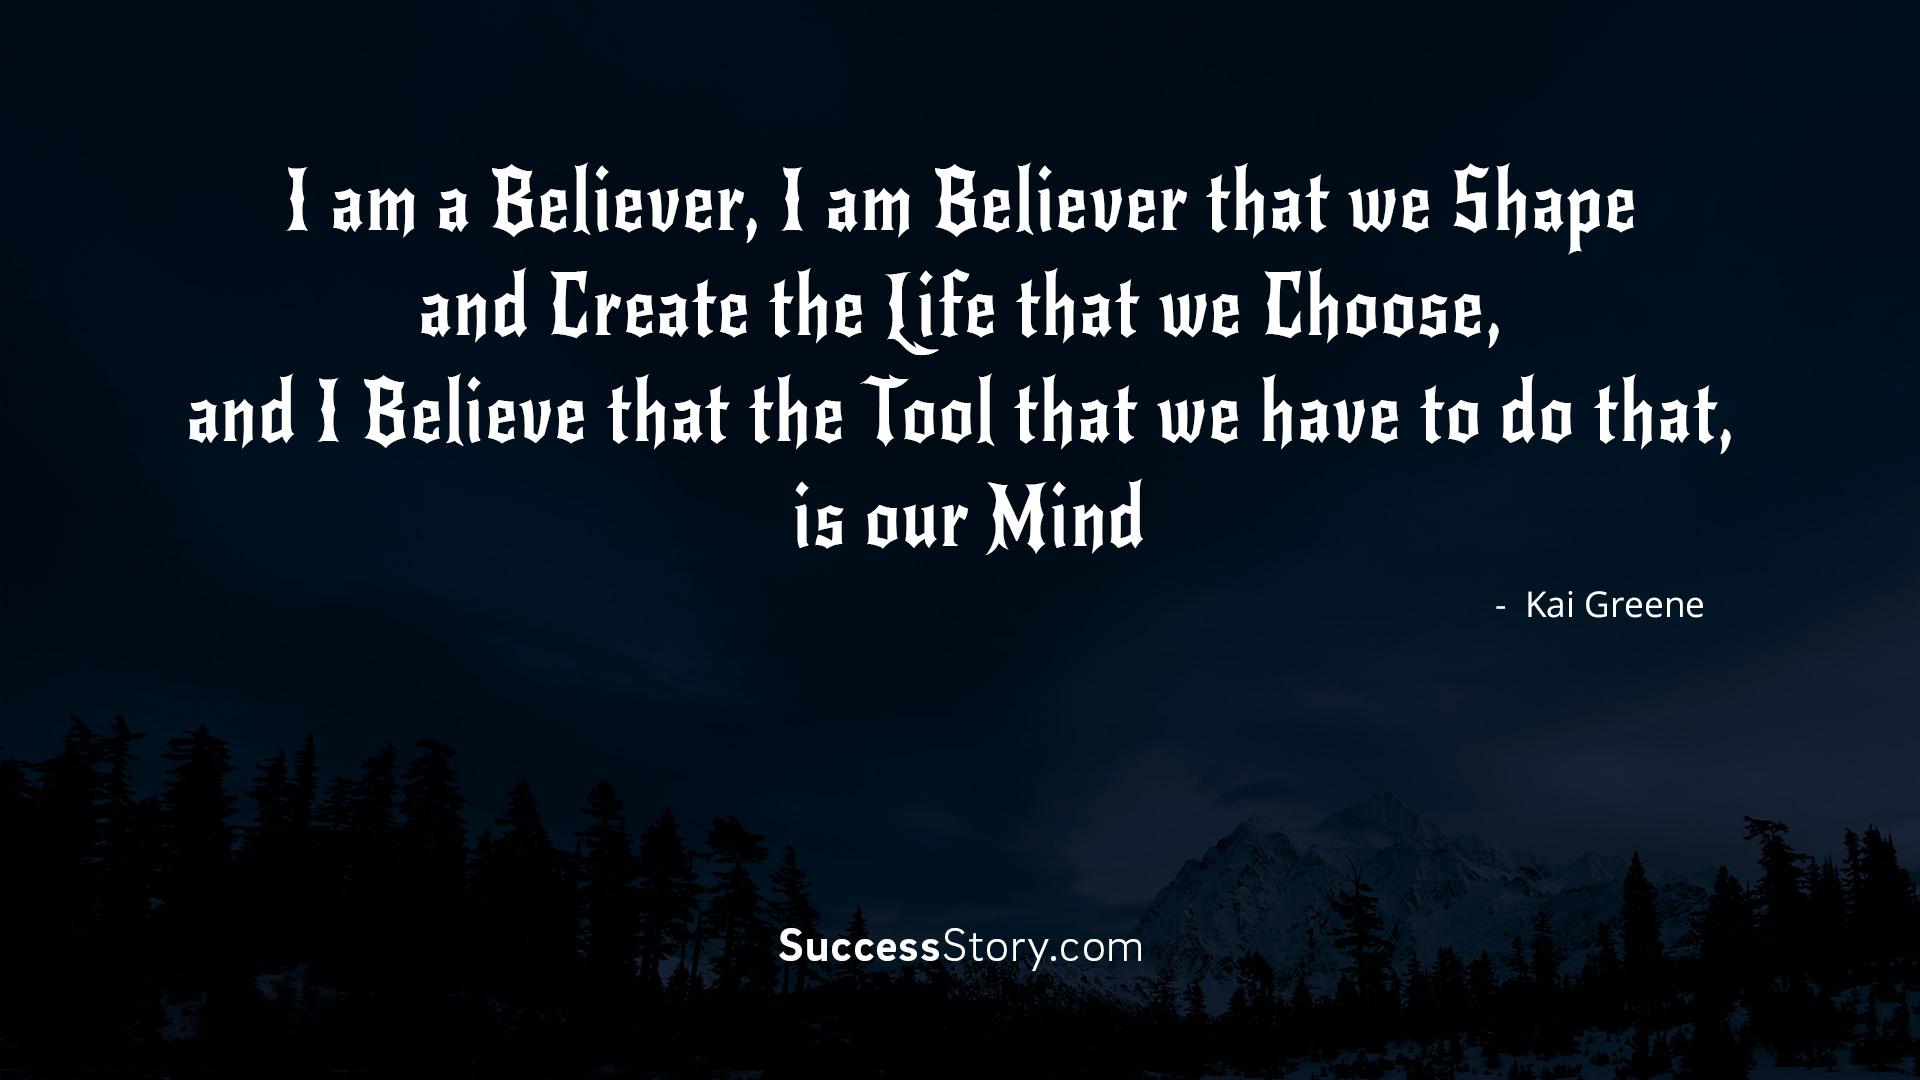 I am a believer, I